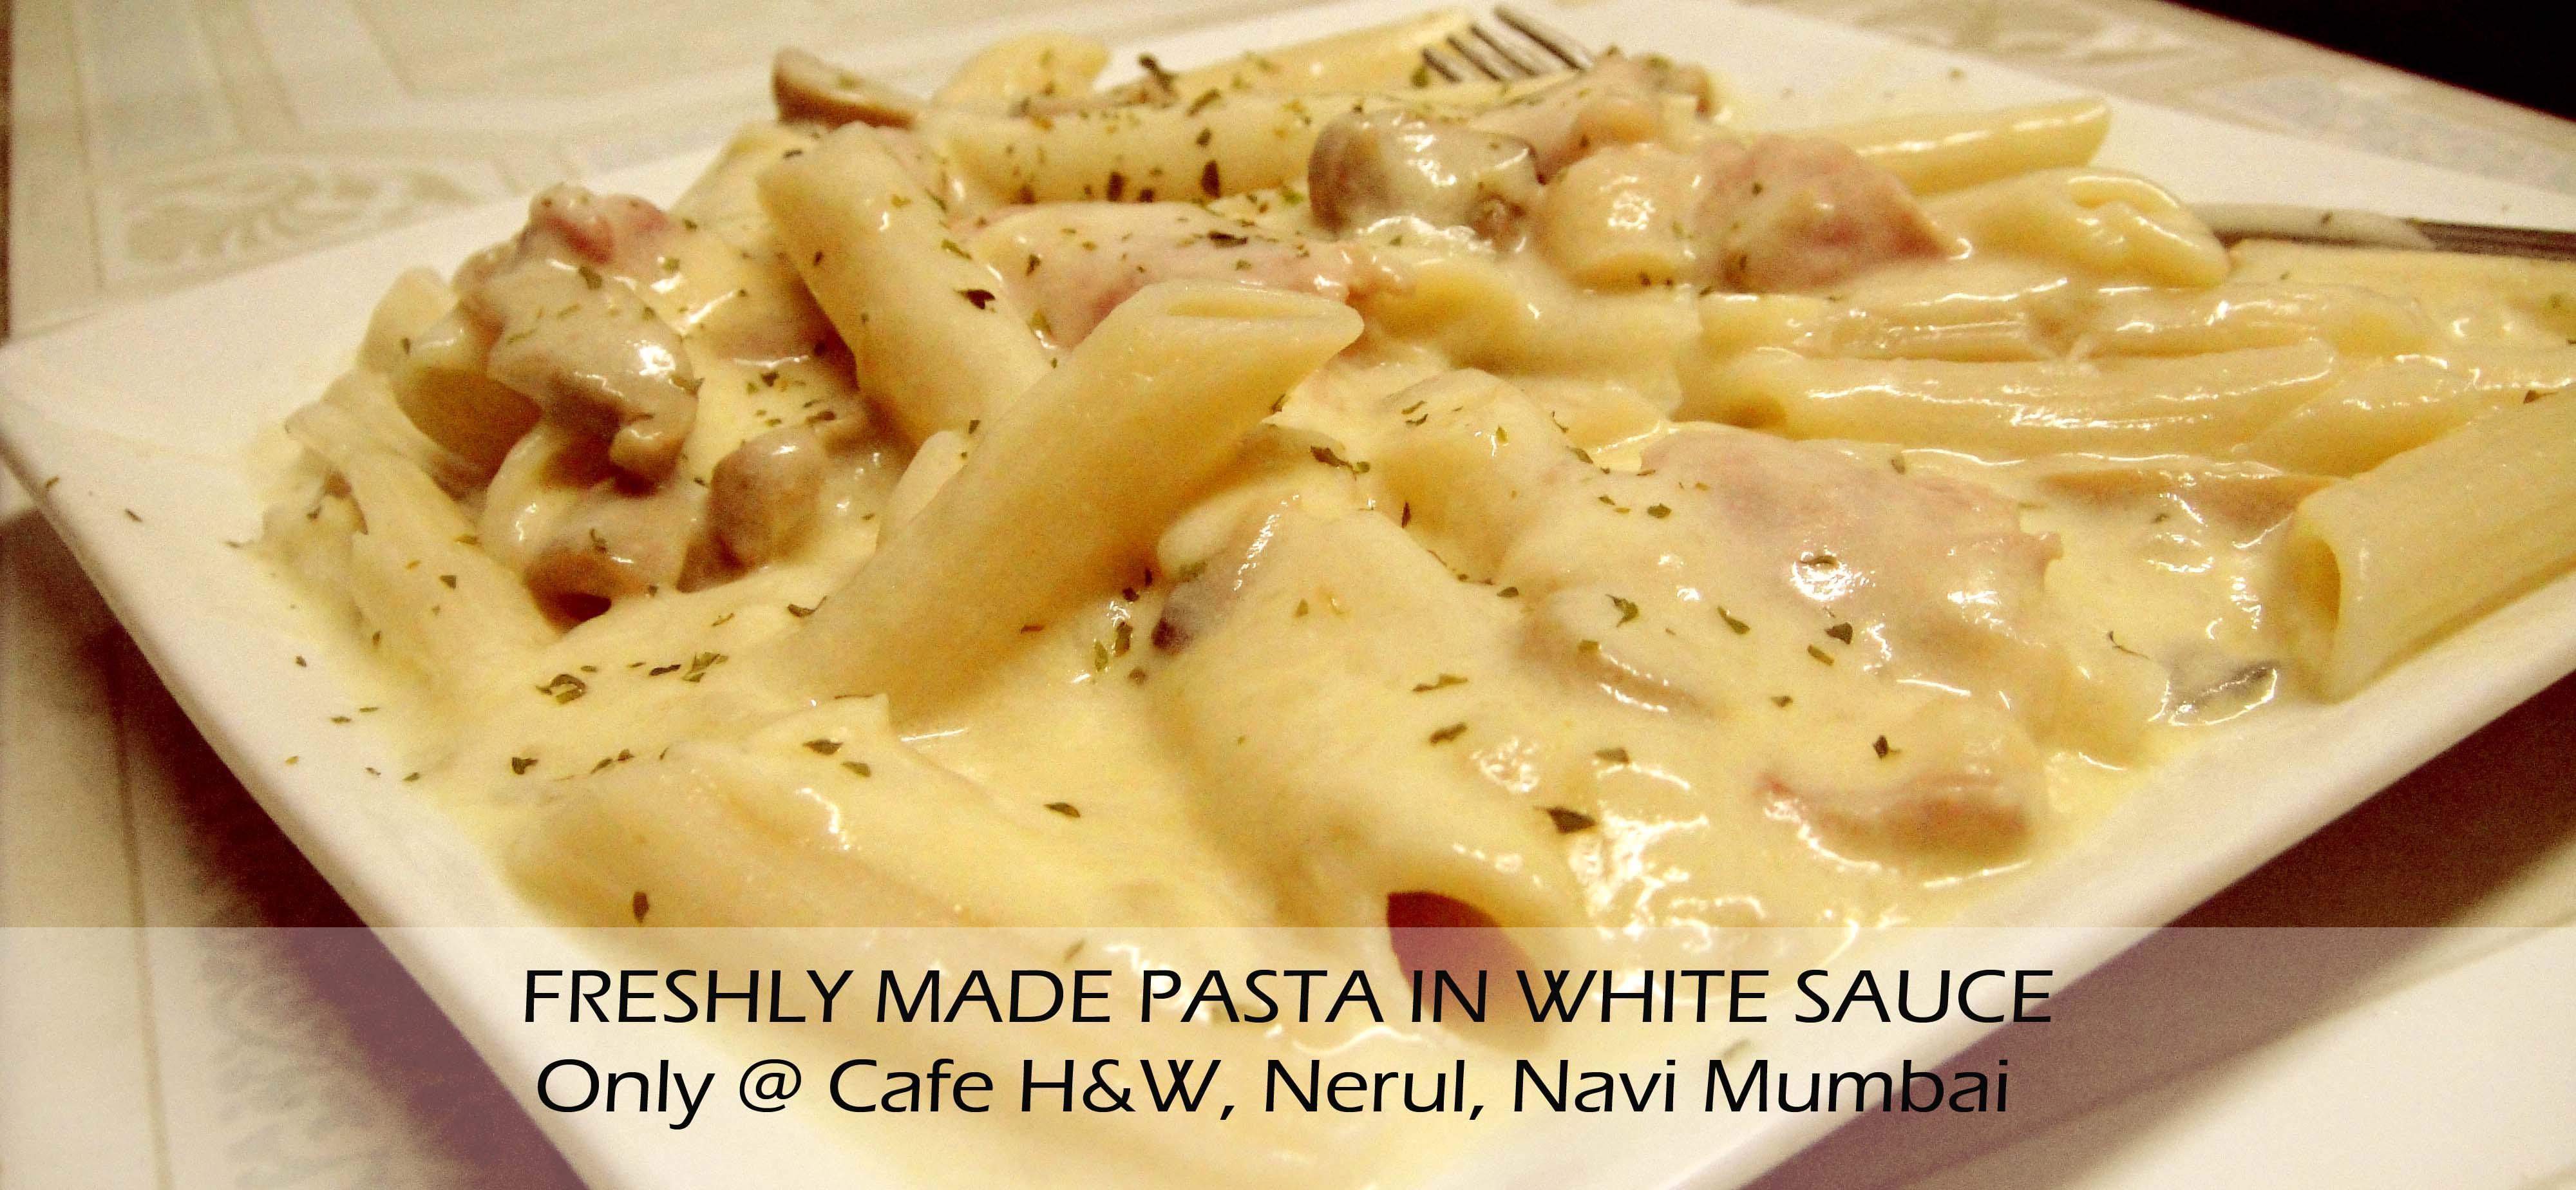 white sauce pasta copy.jpg